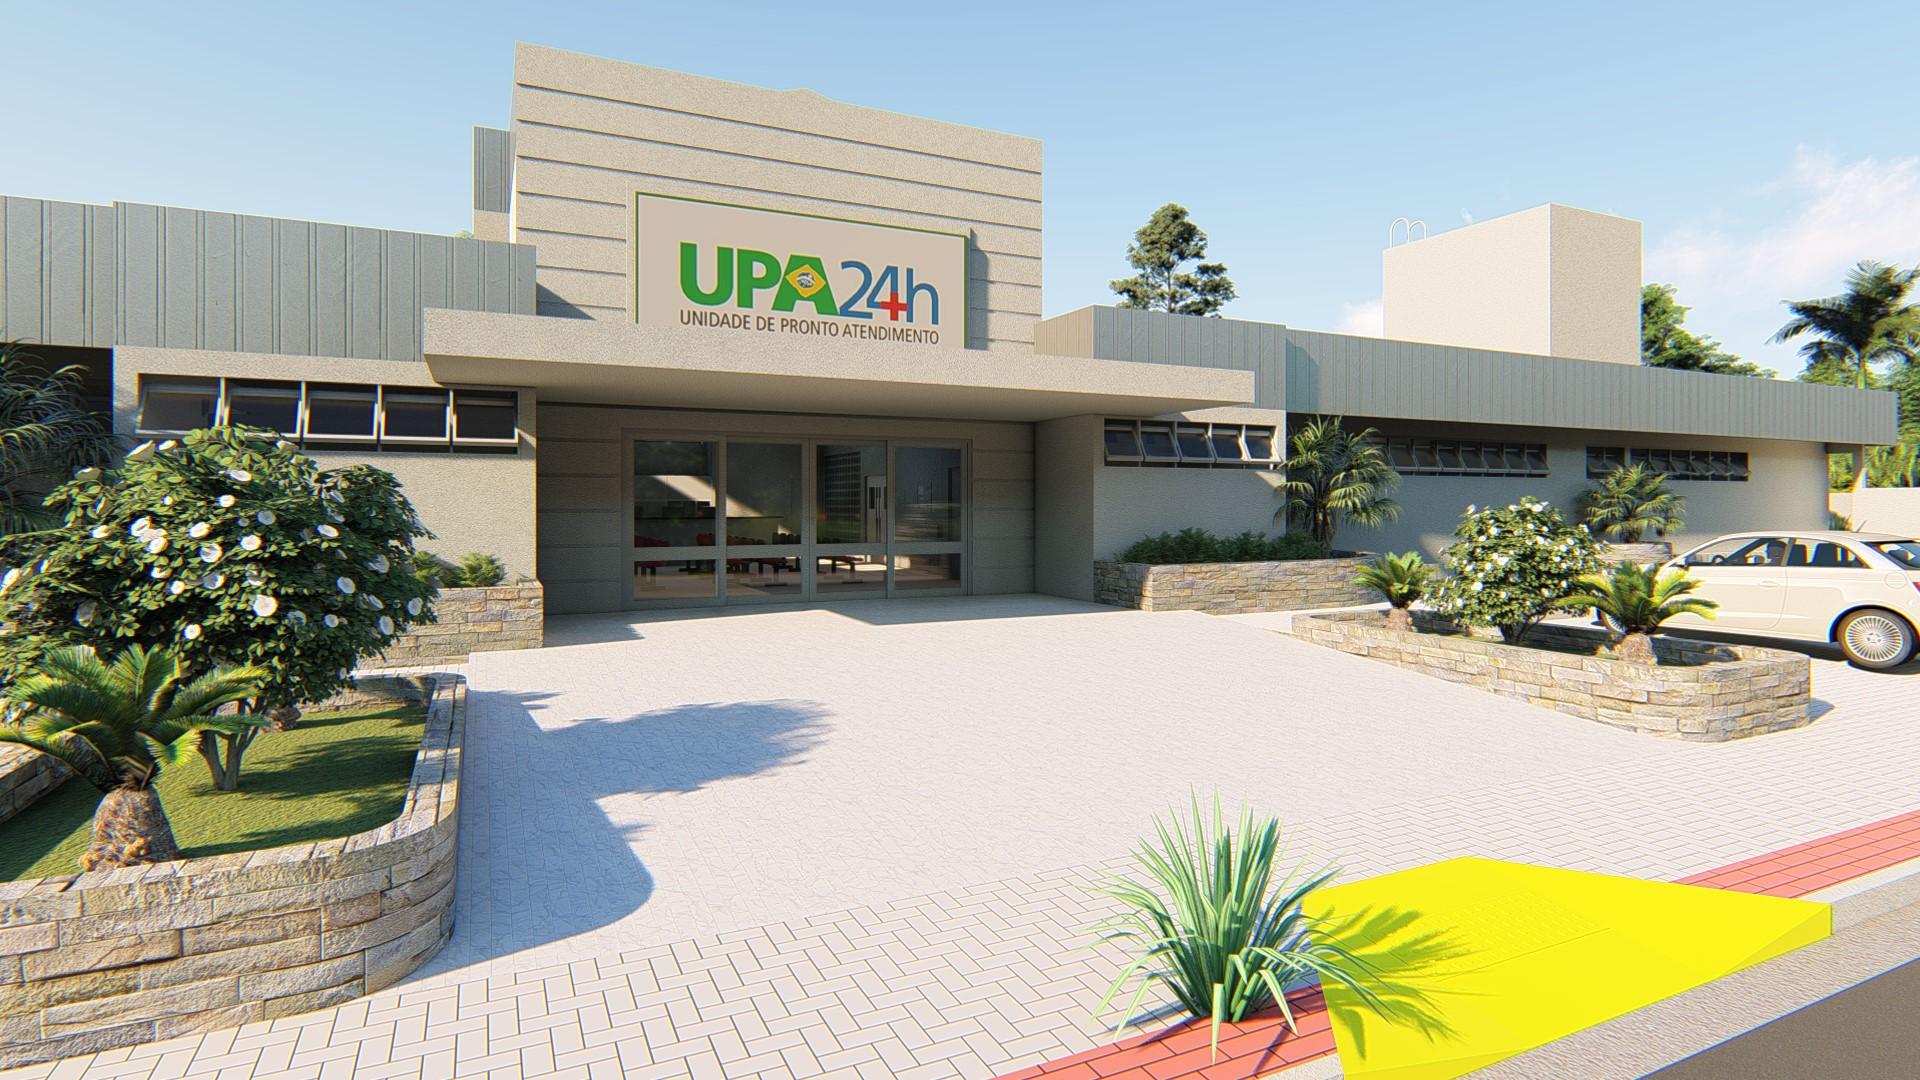 UPA_Photo - 7